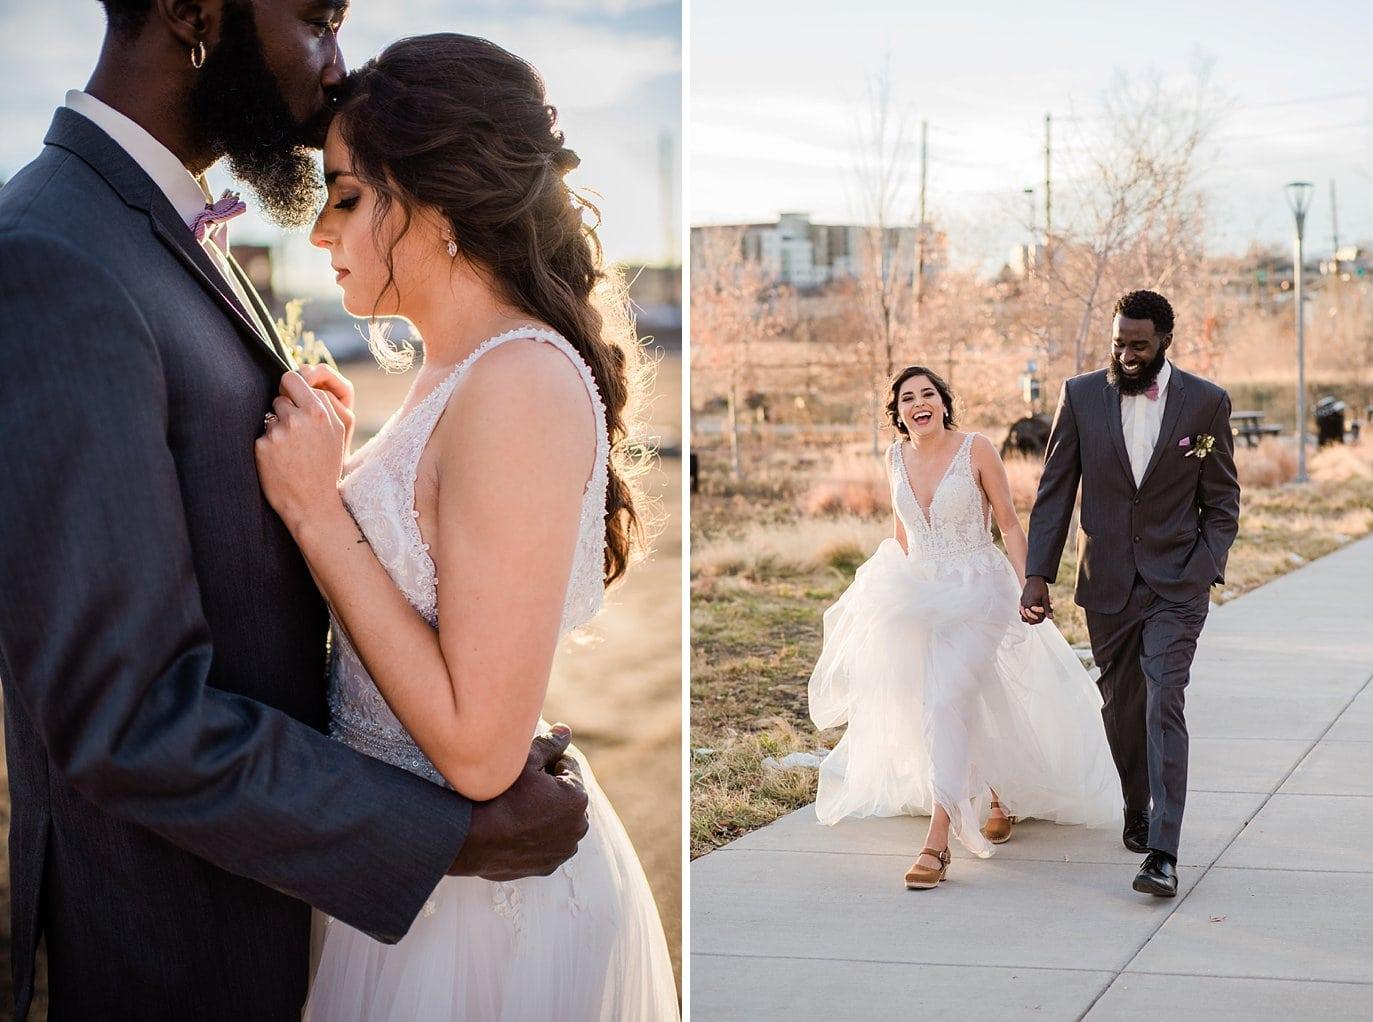 romantic sunset bride and groom photo at Shyft Denver wedding by Aurora wedding photographer Jennie Crate photographer